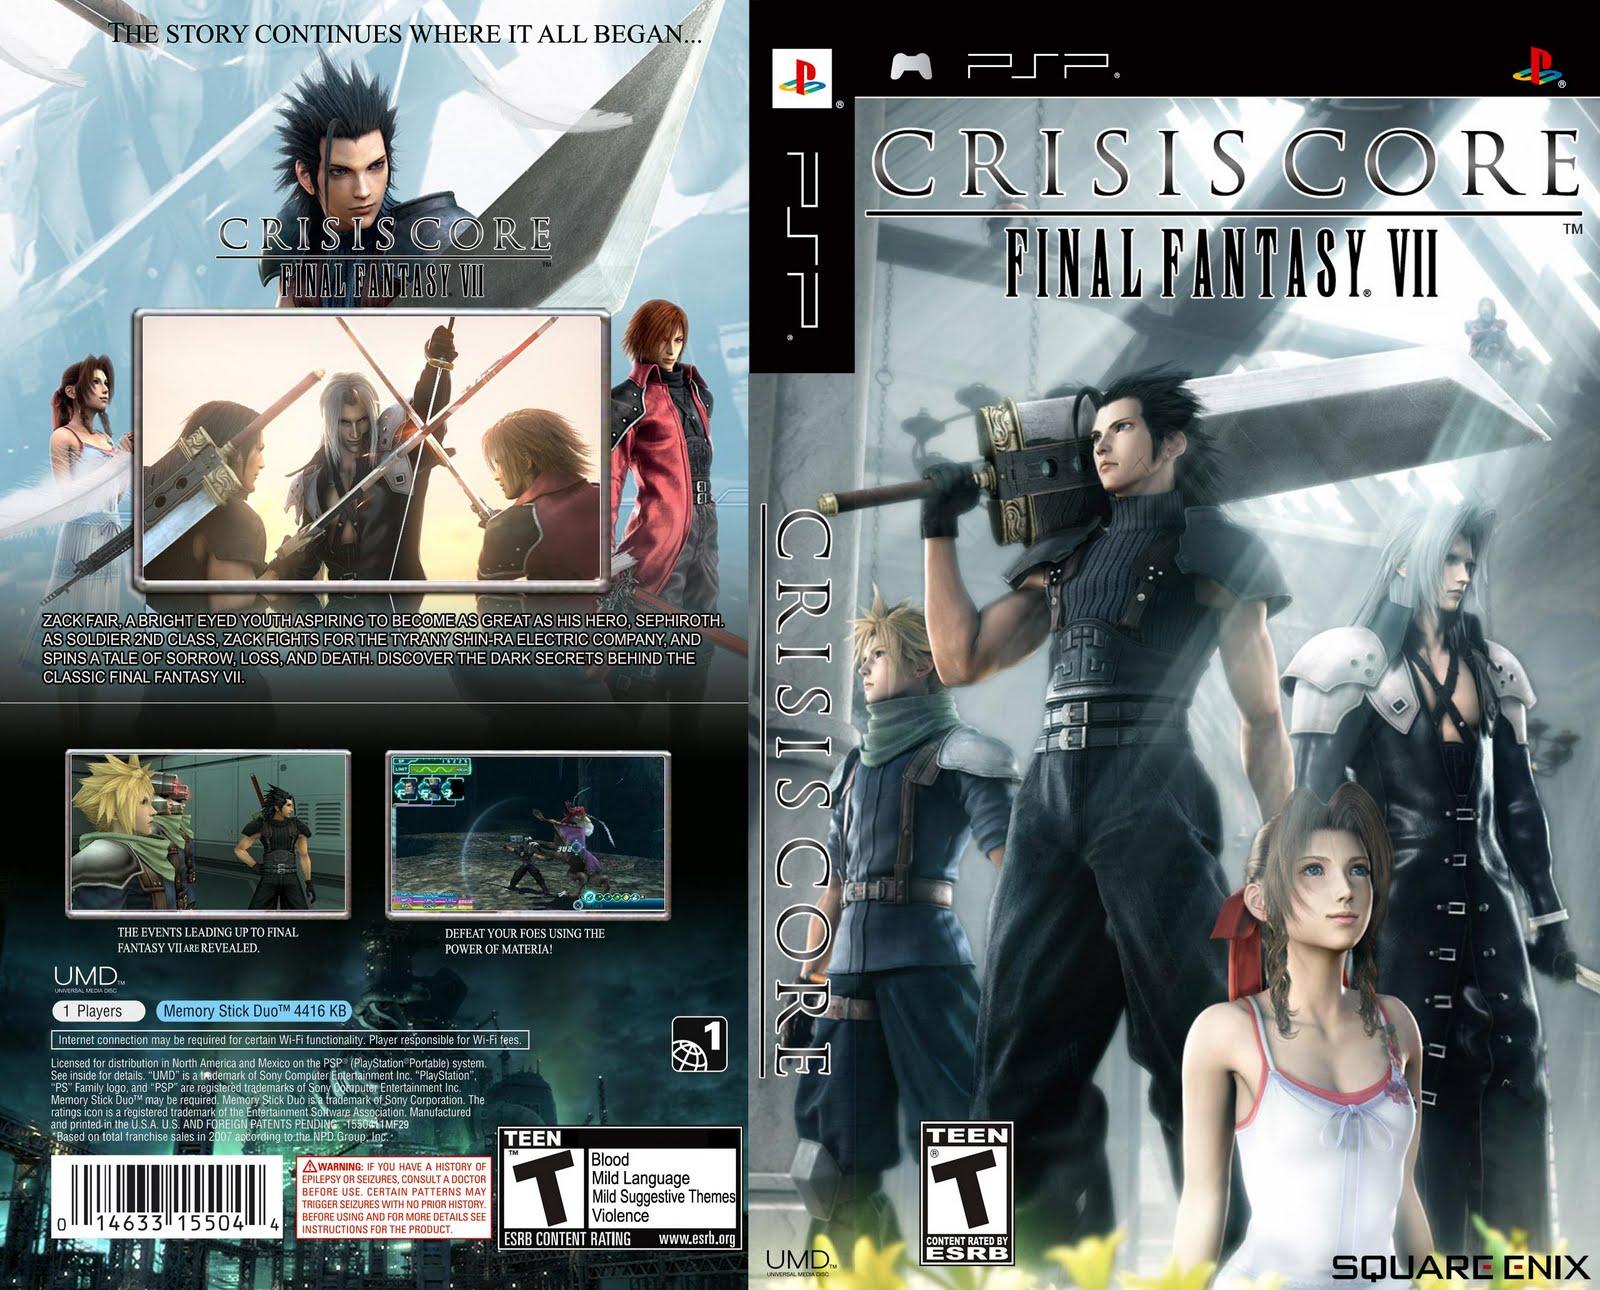 Crisis core final fantasy vii usa   welcome hacking free & games.